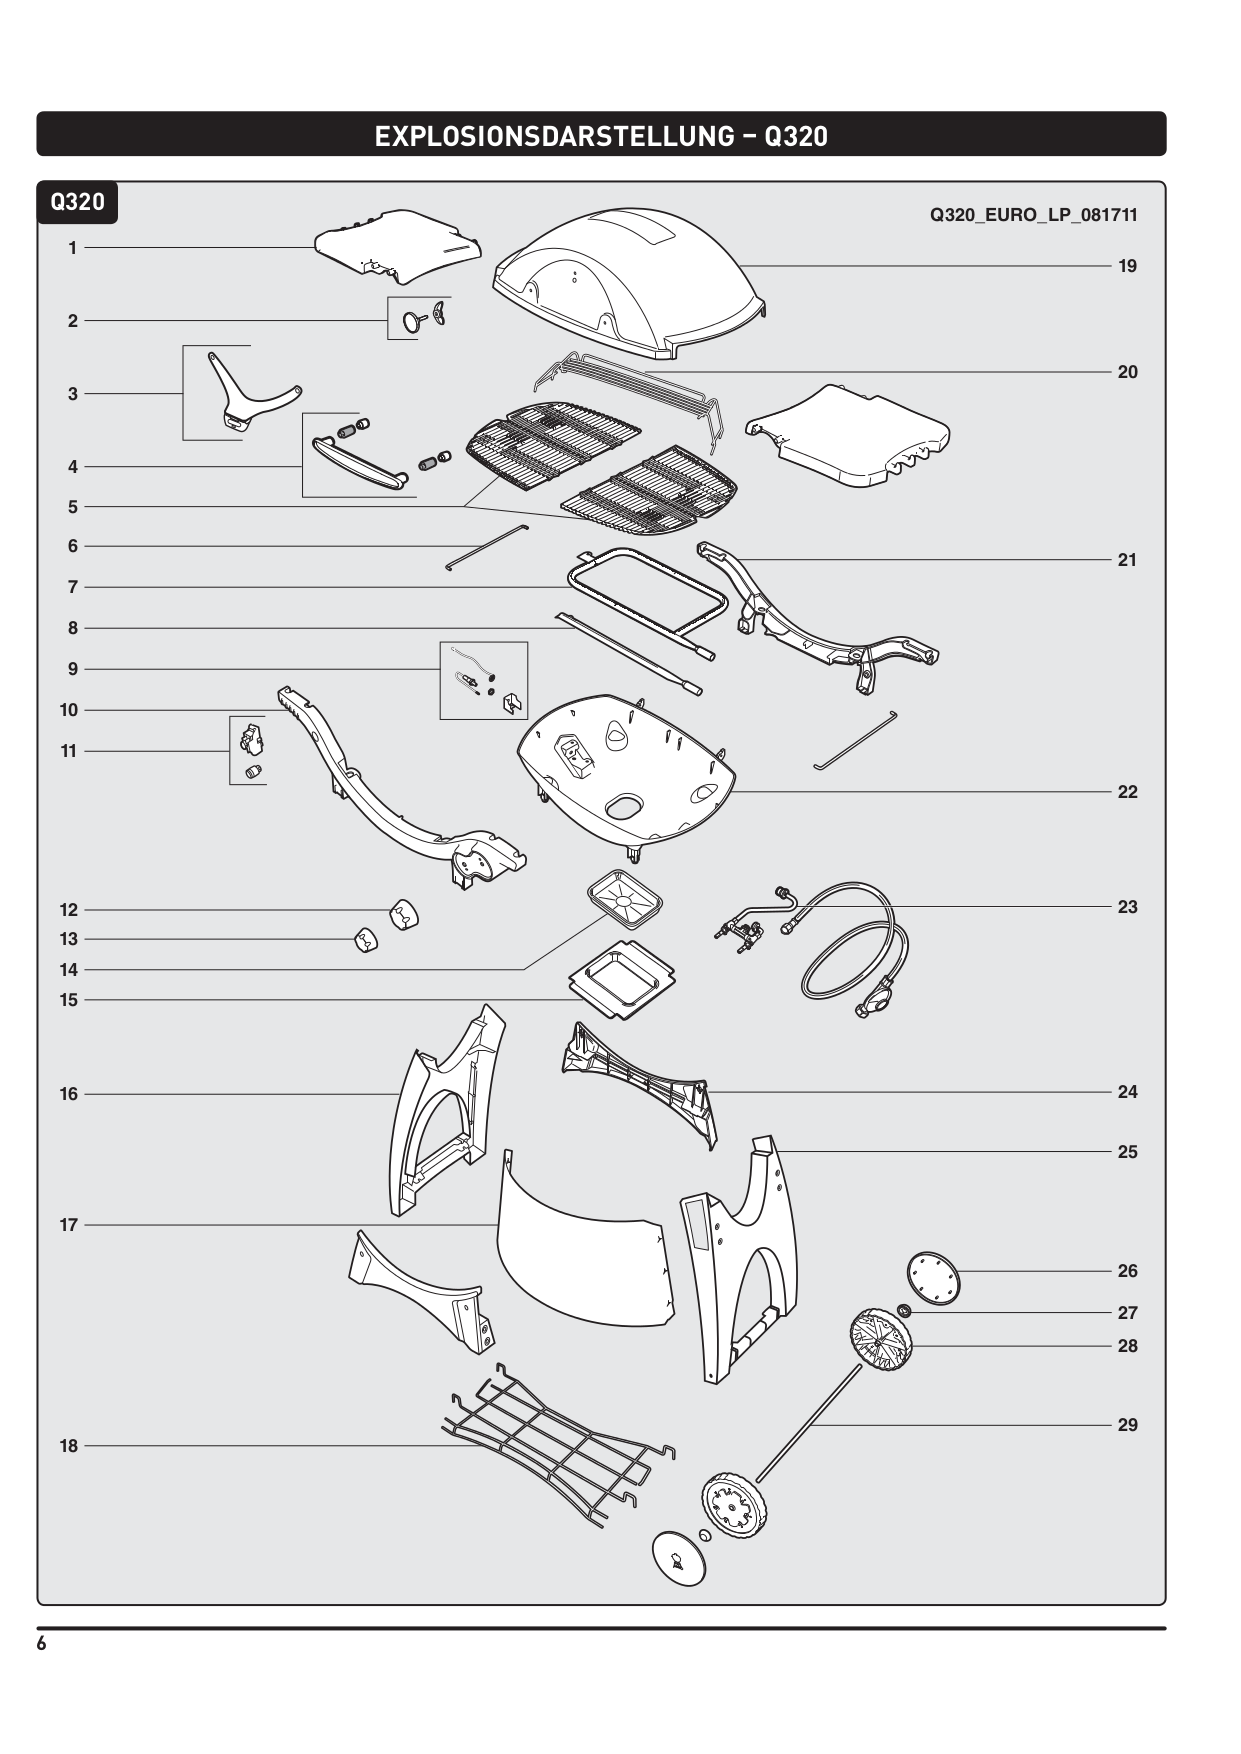 pdf manual for weber grill q 300 rh umlib com Weber Q 320 On Sale weber q 320 manual pdf